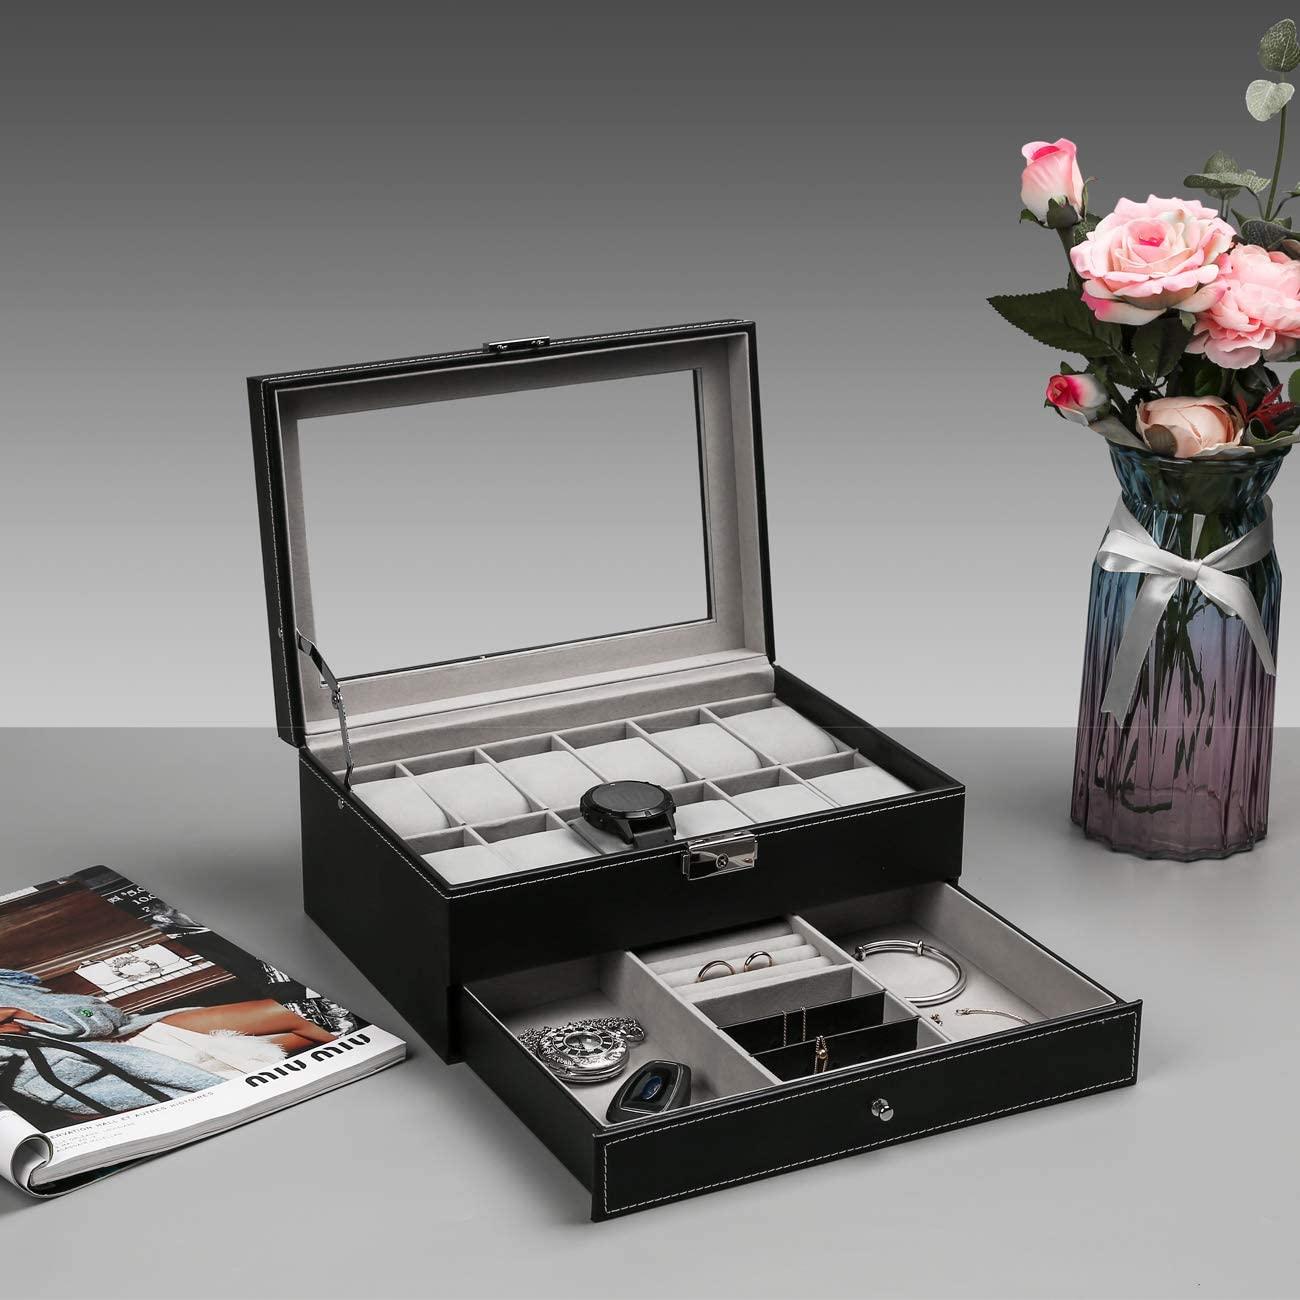 3. Leather Watch Box